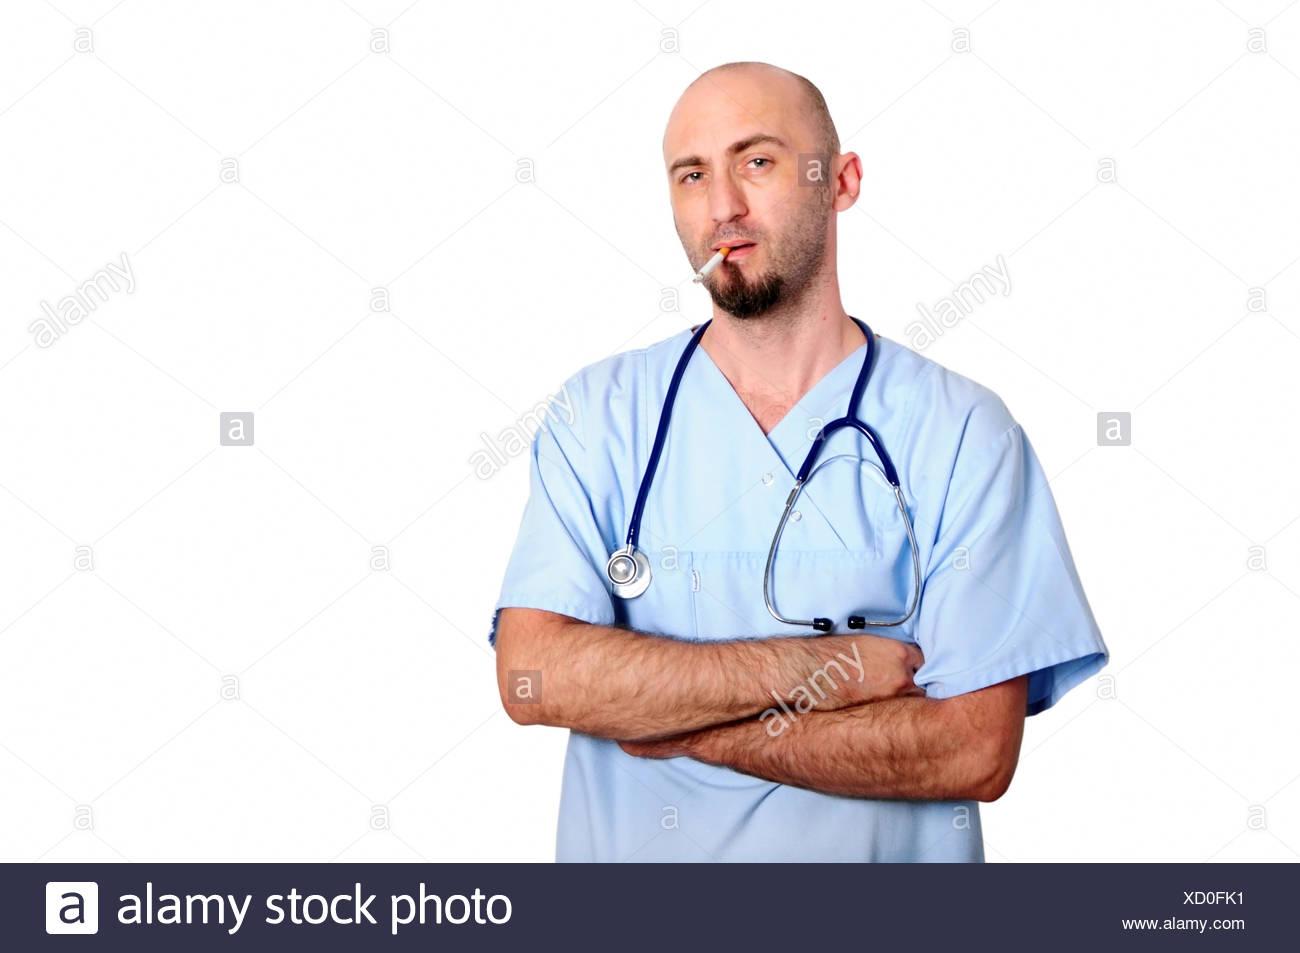 smoking doctor - Stock Image